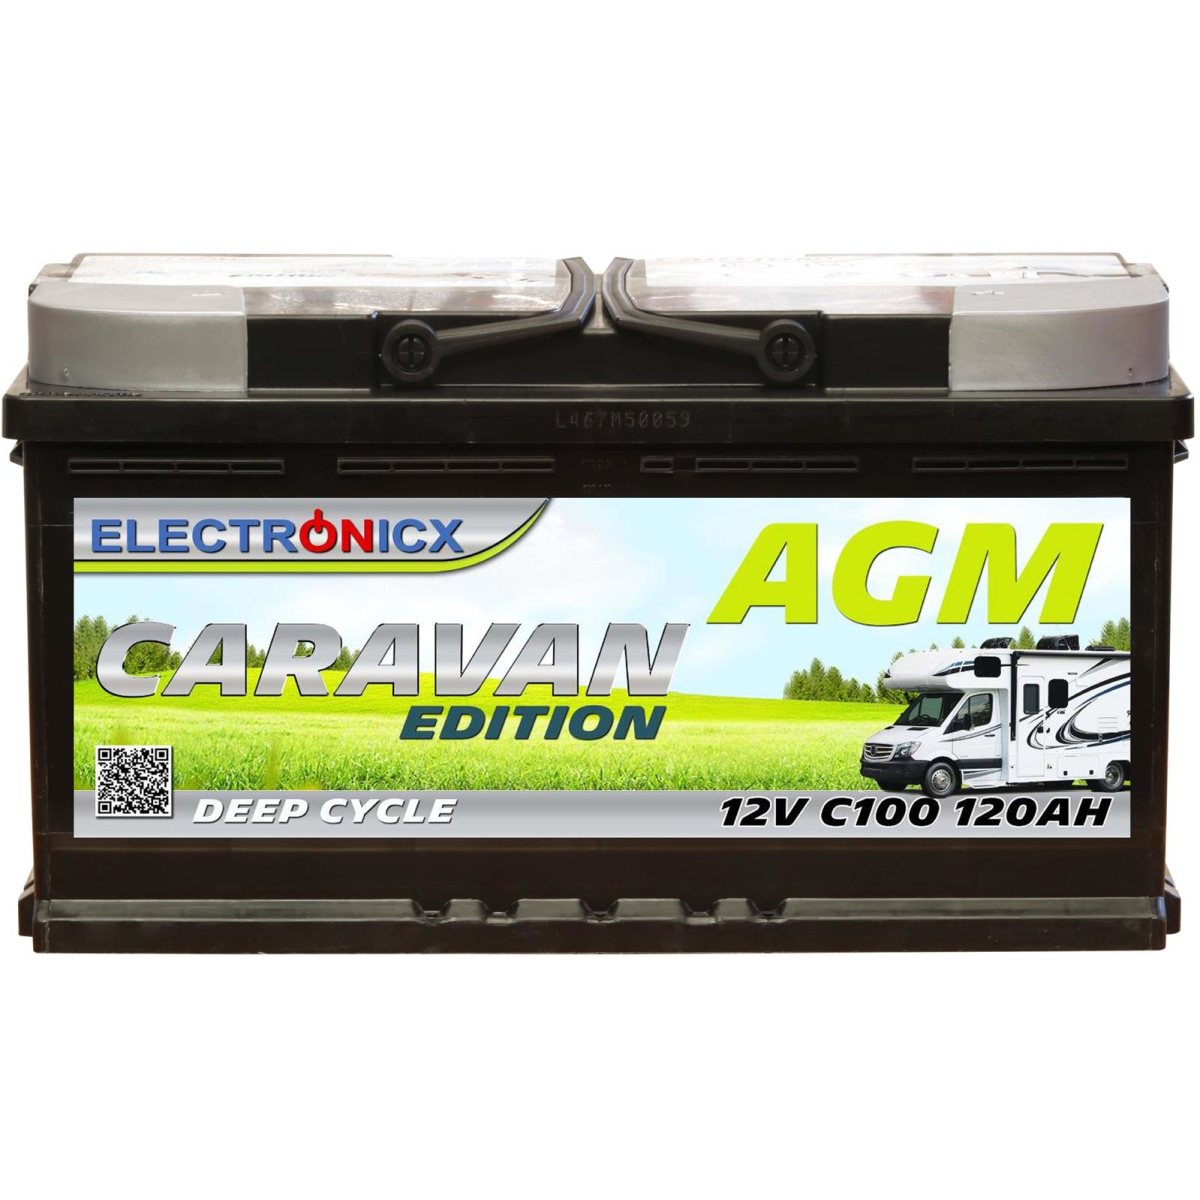 Electronicx Caravan Edition battery agm 120 ah 12v motorhome boat supply